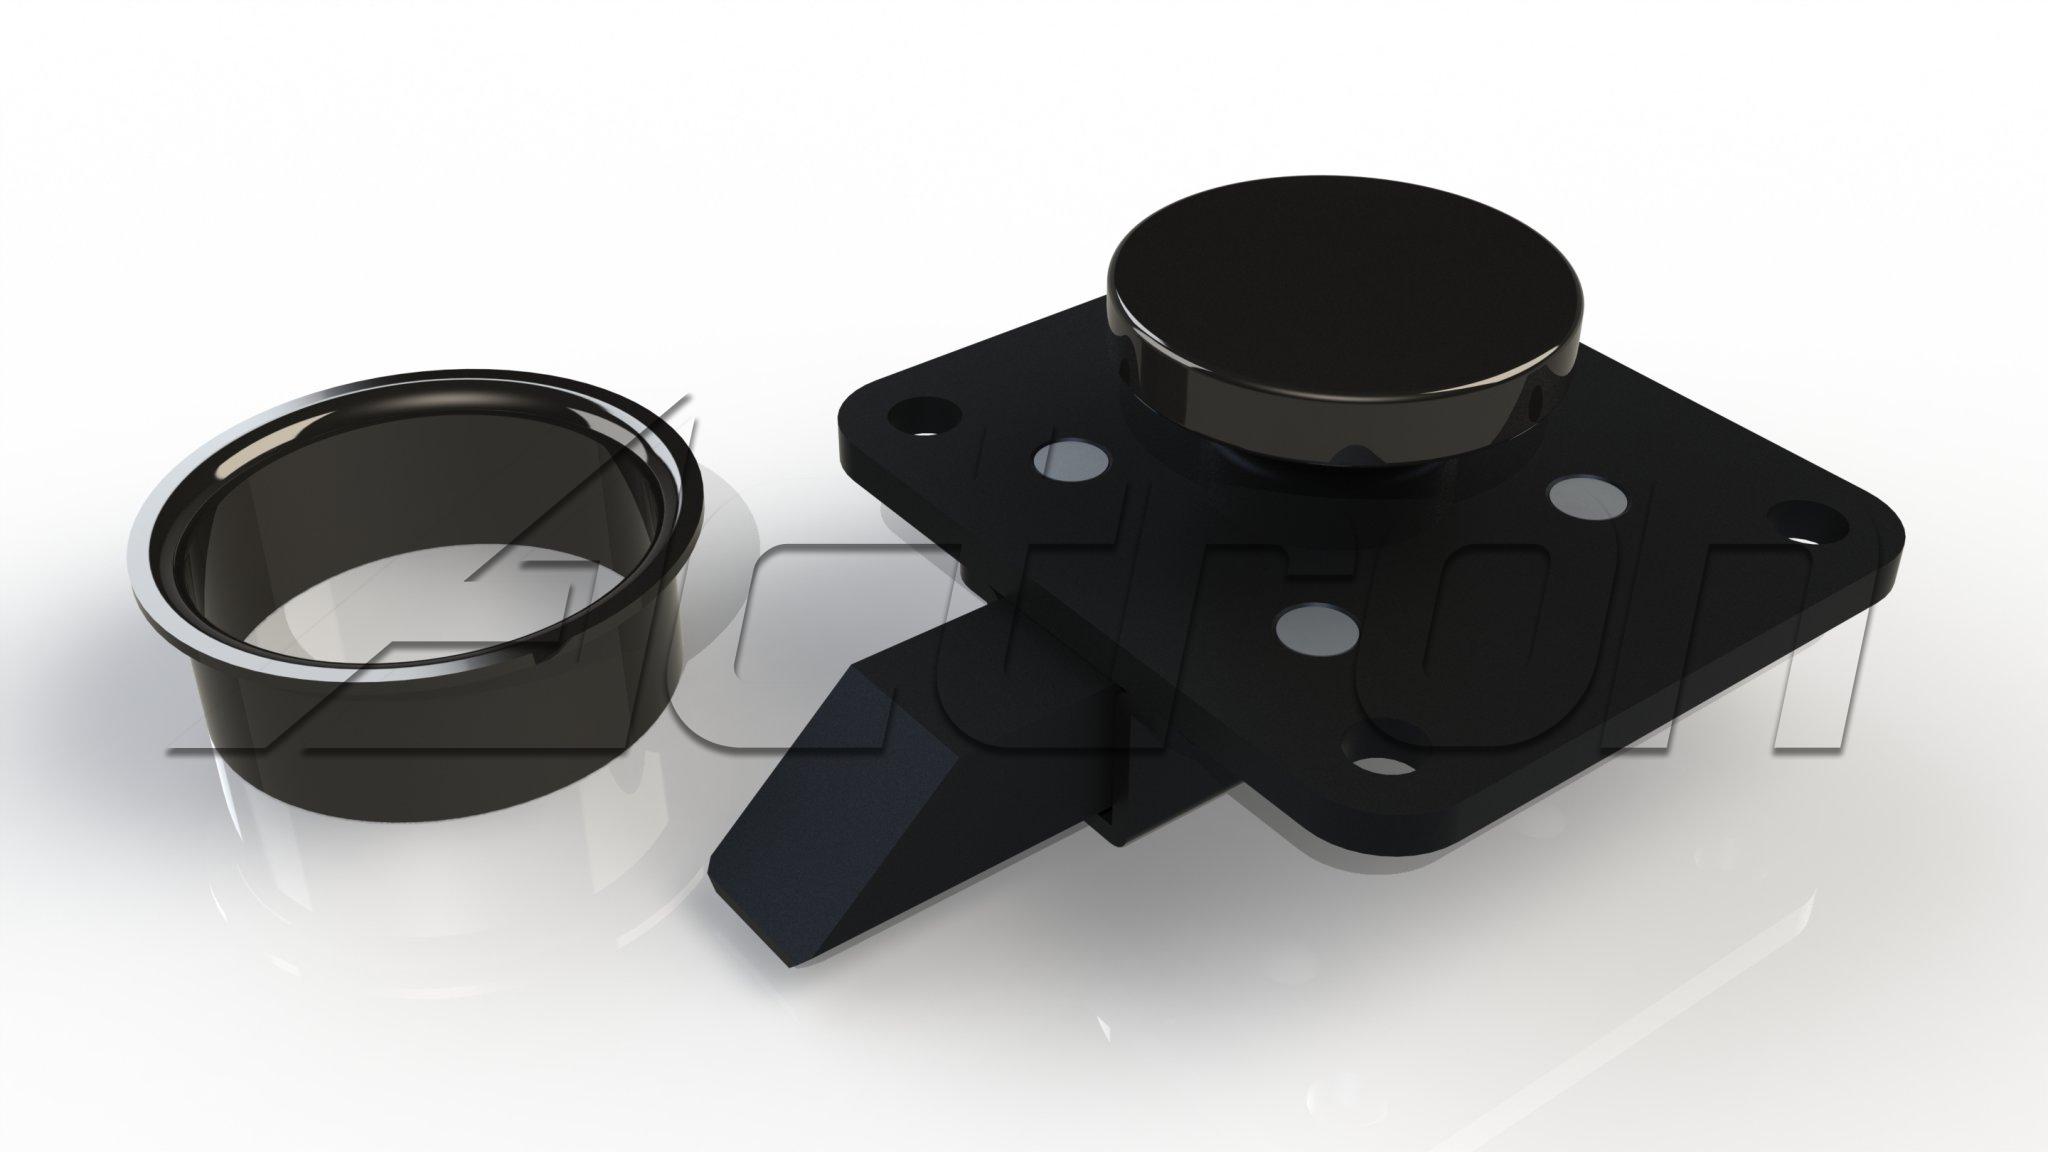 latch-assy-8211-push-button-5520-a30013.jpg